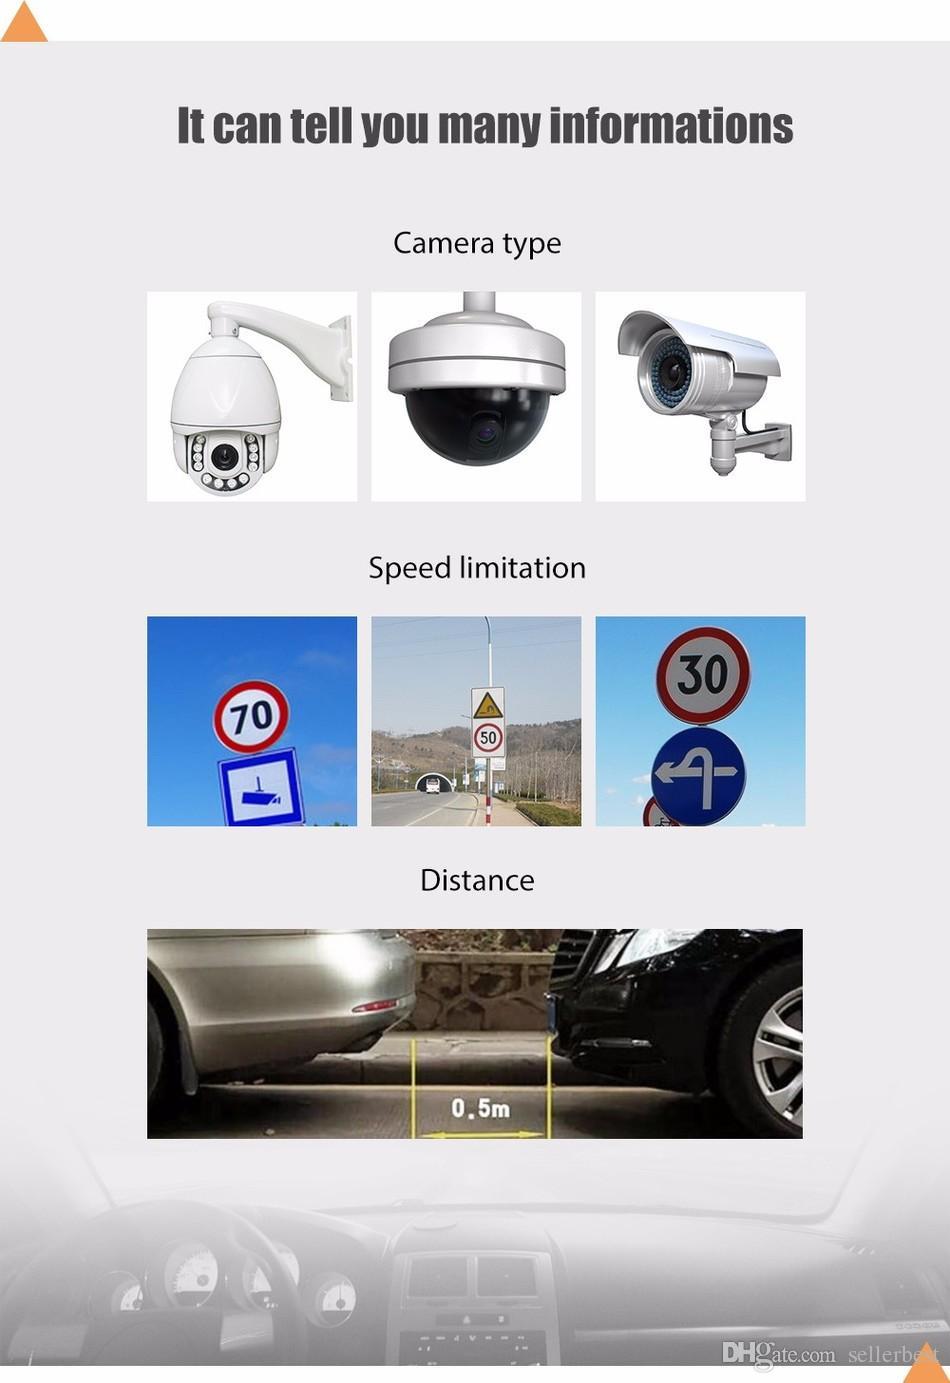 K KA X Car Speed V6 Laser Radar Detector Voice Alert Warning 16 Band Auto 360 Degree Russia English Voice Alarm System